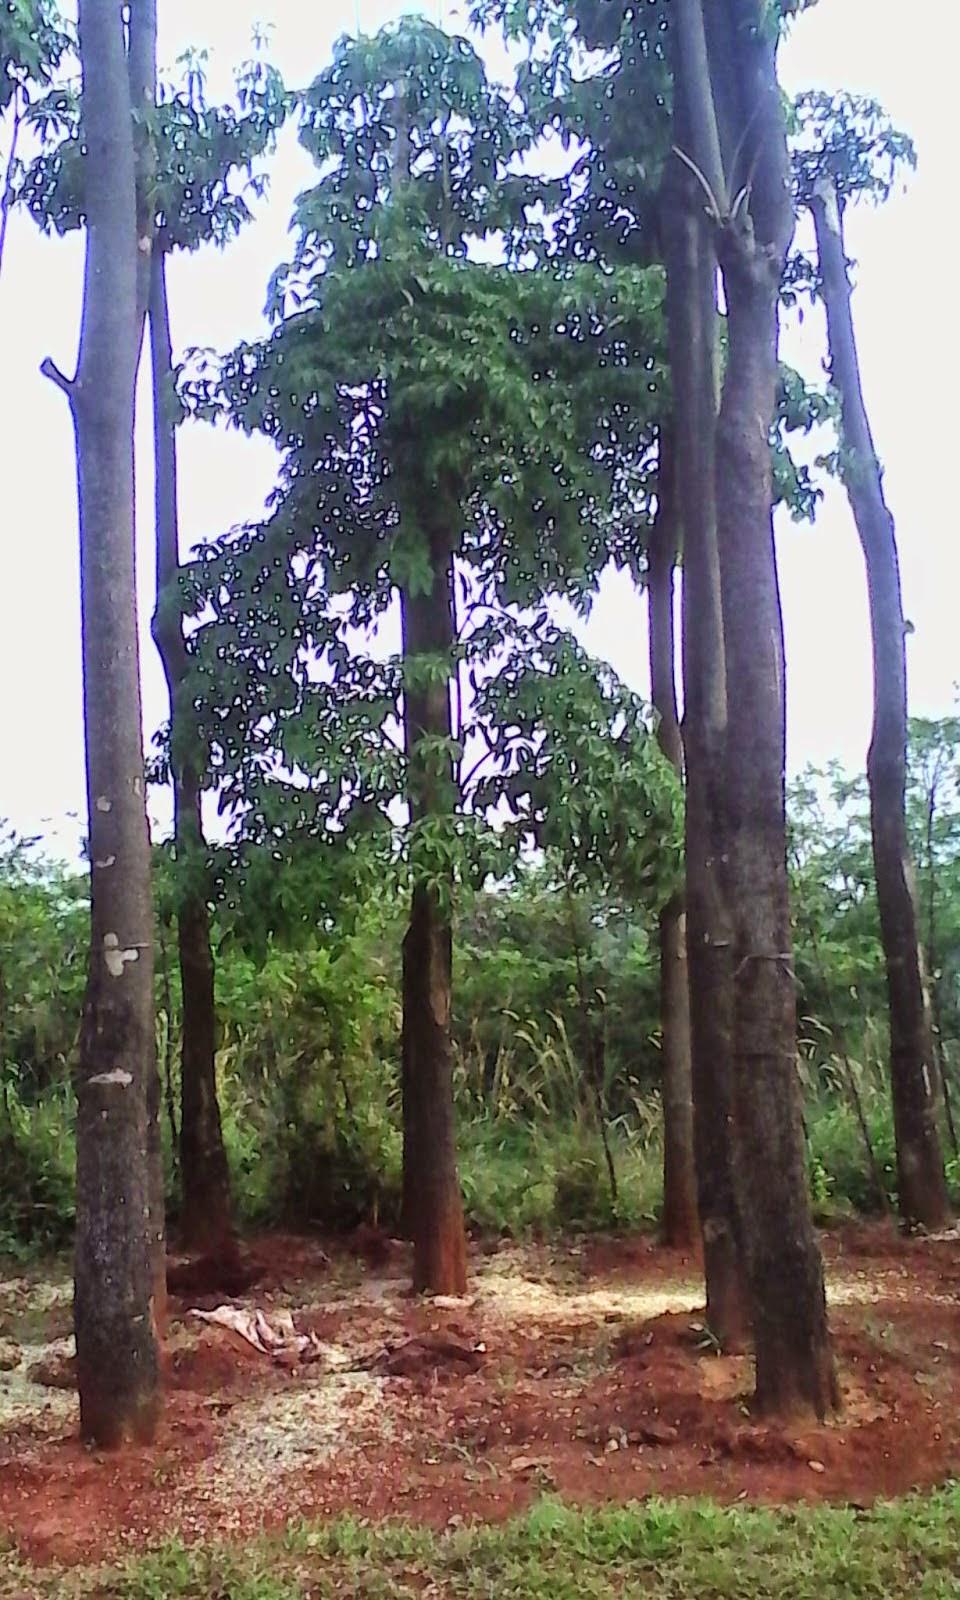 Pohon Pule | Pohon Pelindung | Tanaman Hias | Jasa Tukang Taman | Suplier Tanaman Hias | Aneka Rumput